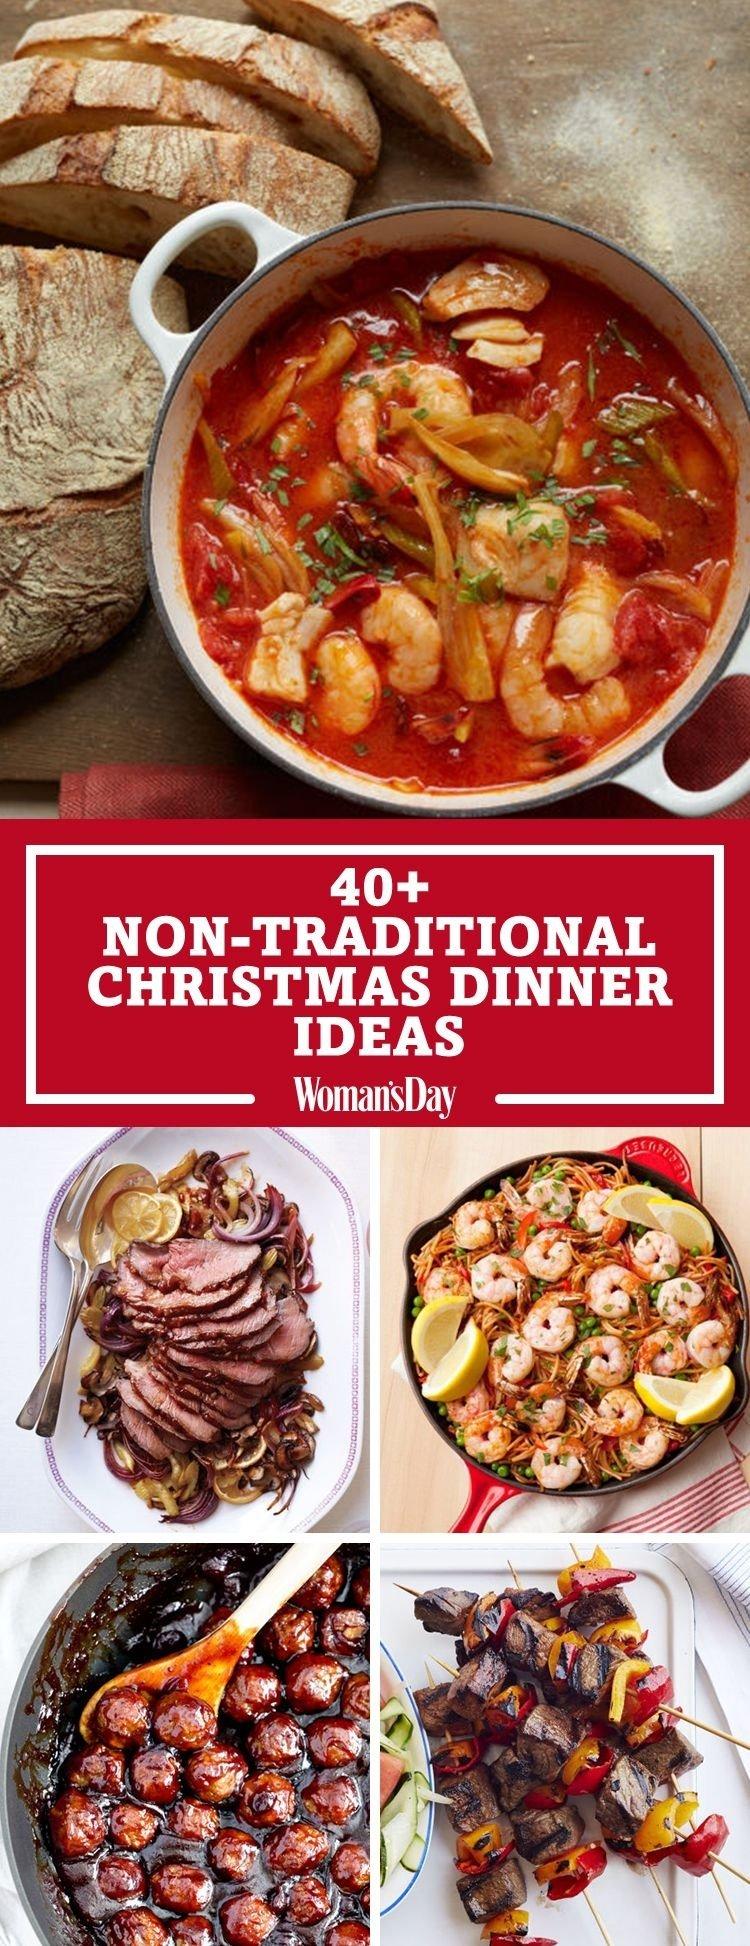 10 Awesome Christmas Ham Dinner Menu Ideas 40 easy christmas dinner ideas best recipes for christmas dinner 9 2021